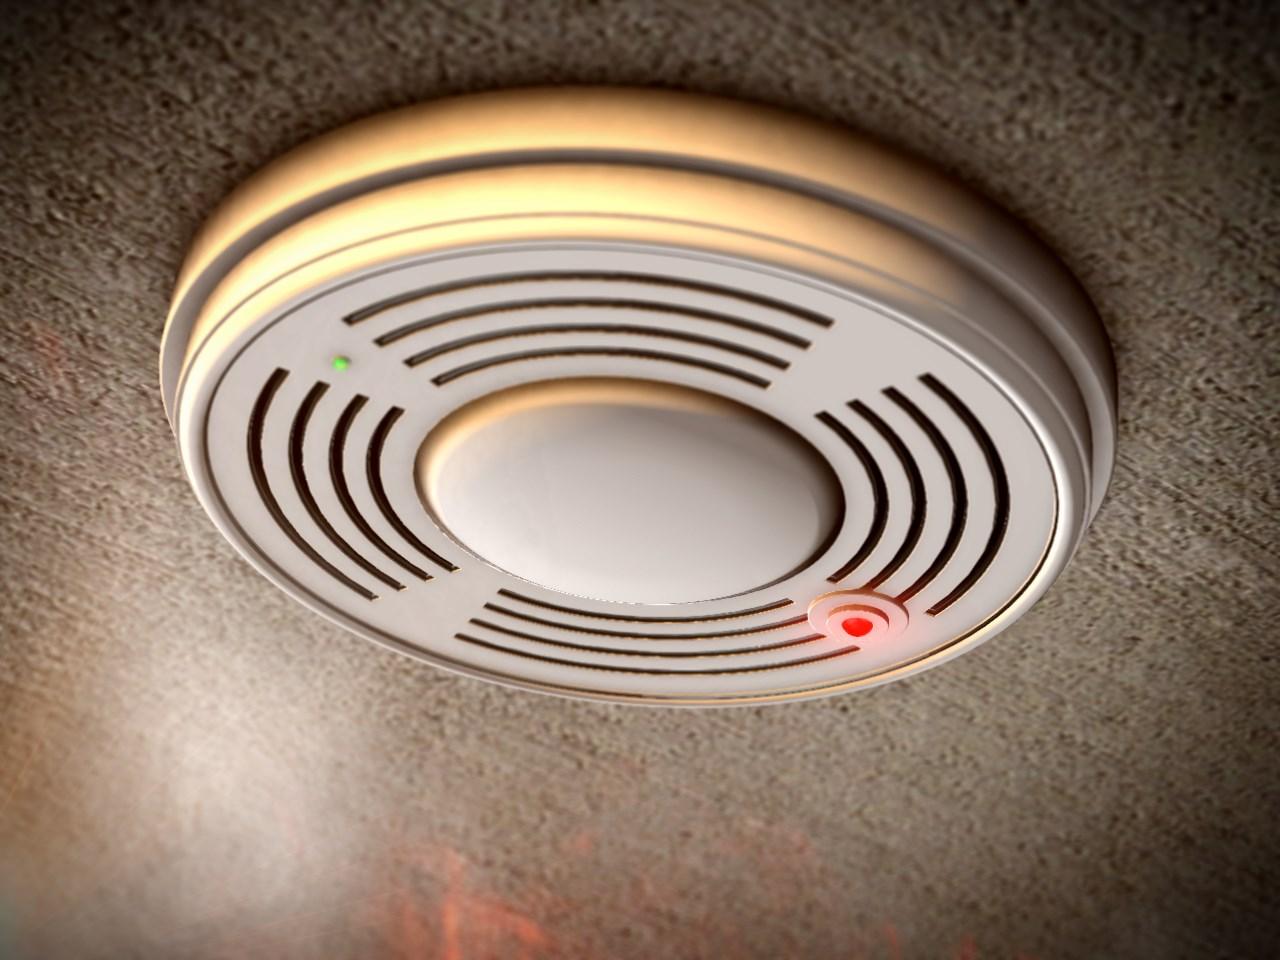 Reminder Change Batteries In Smoke Detectors